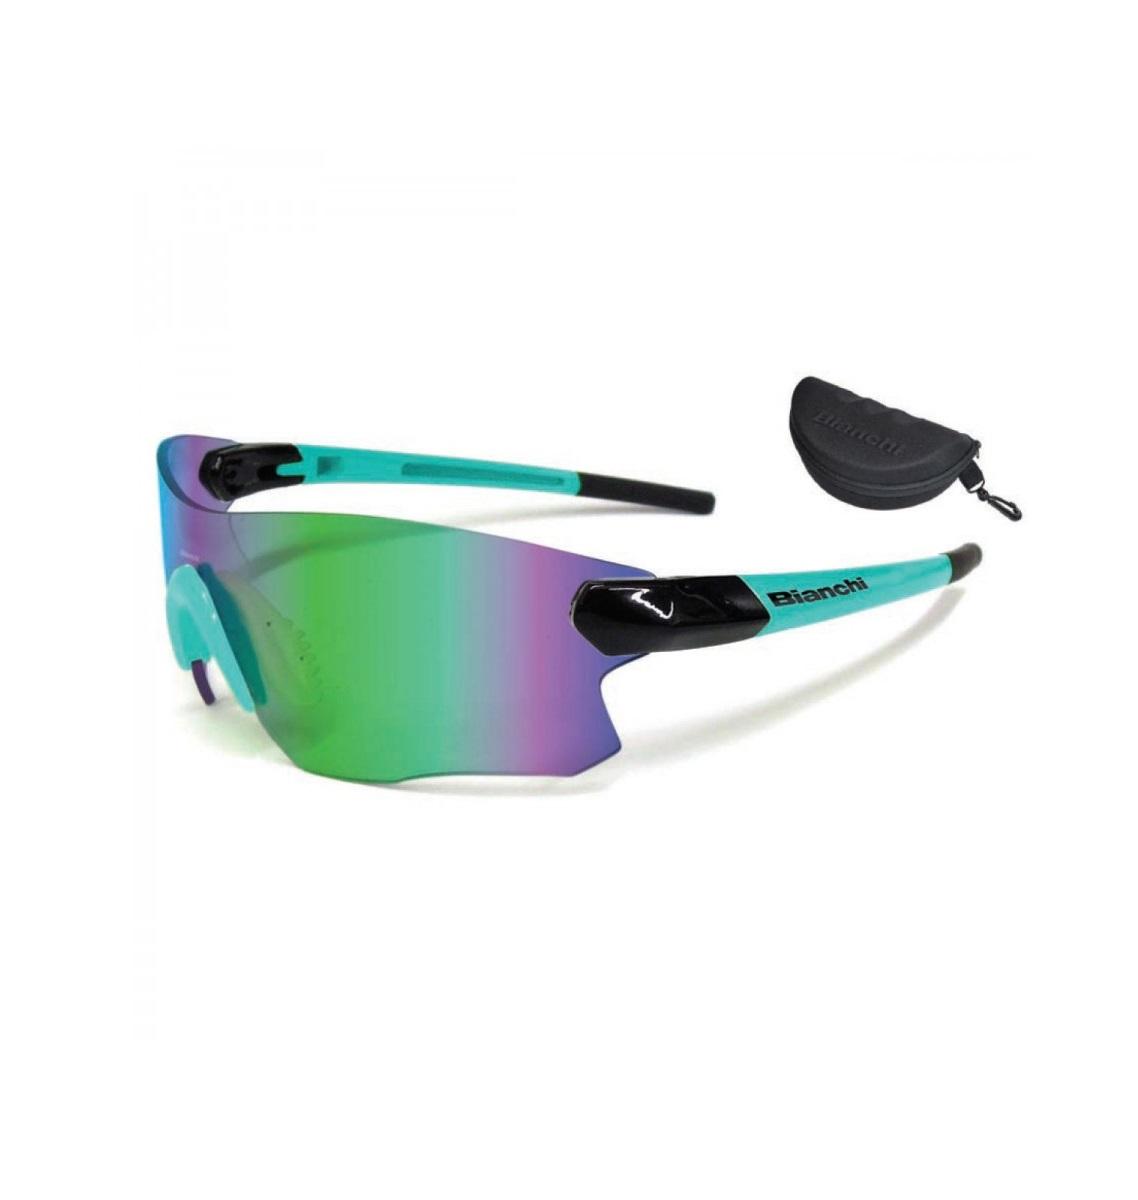 ochelari ciclism ochelari ciclism bianchi sparviero 2 ck16